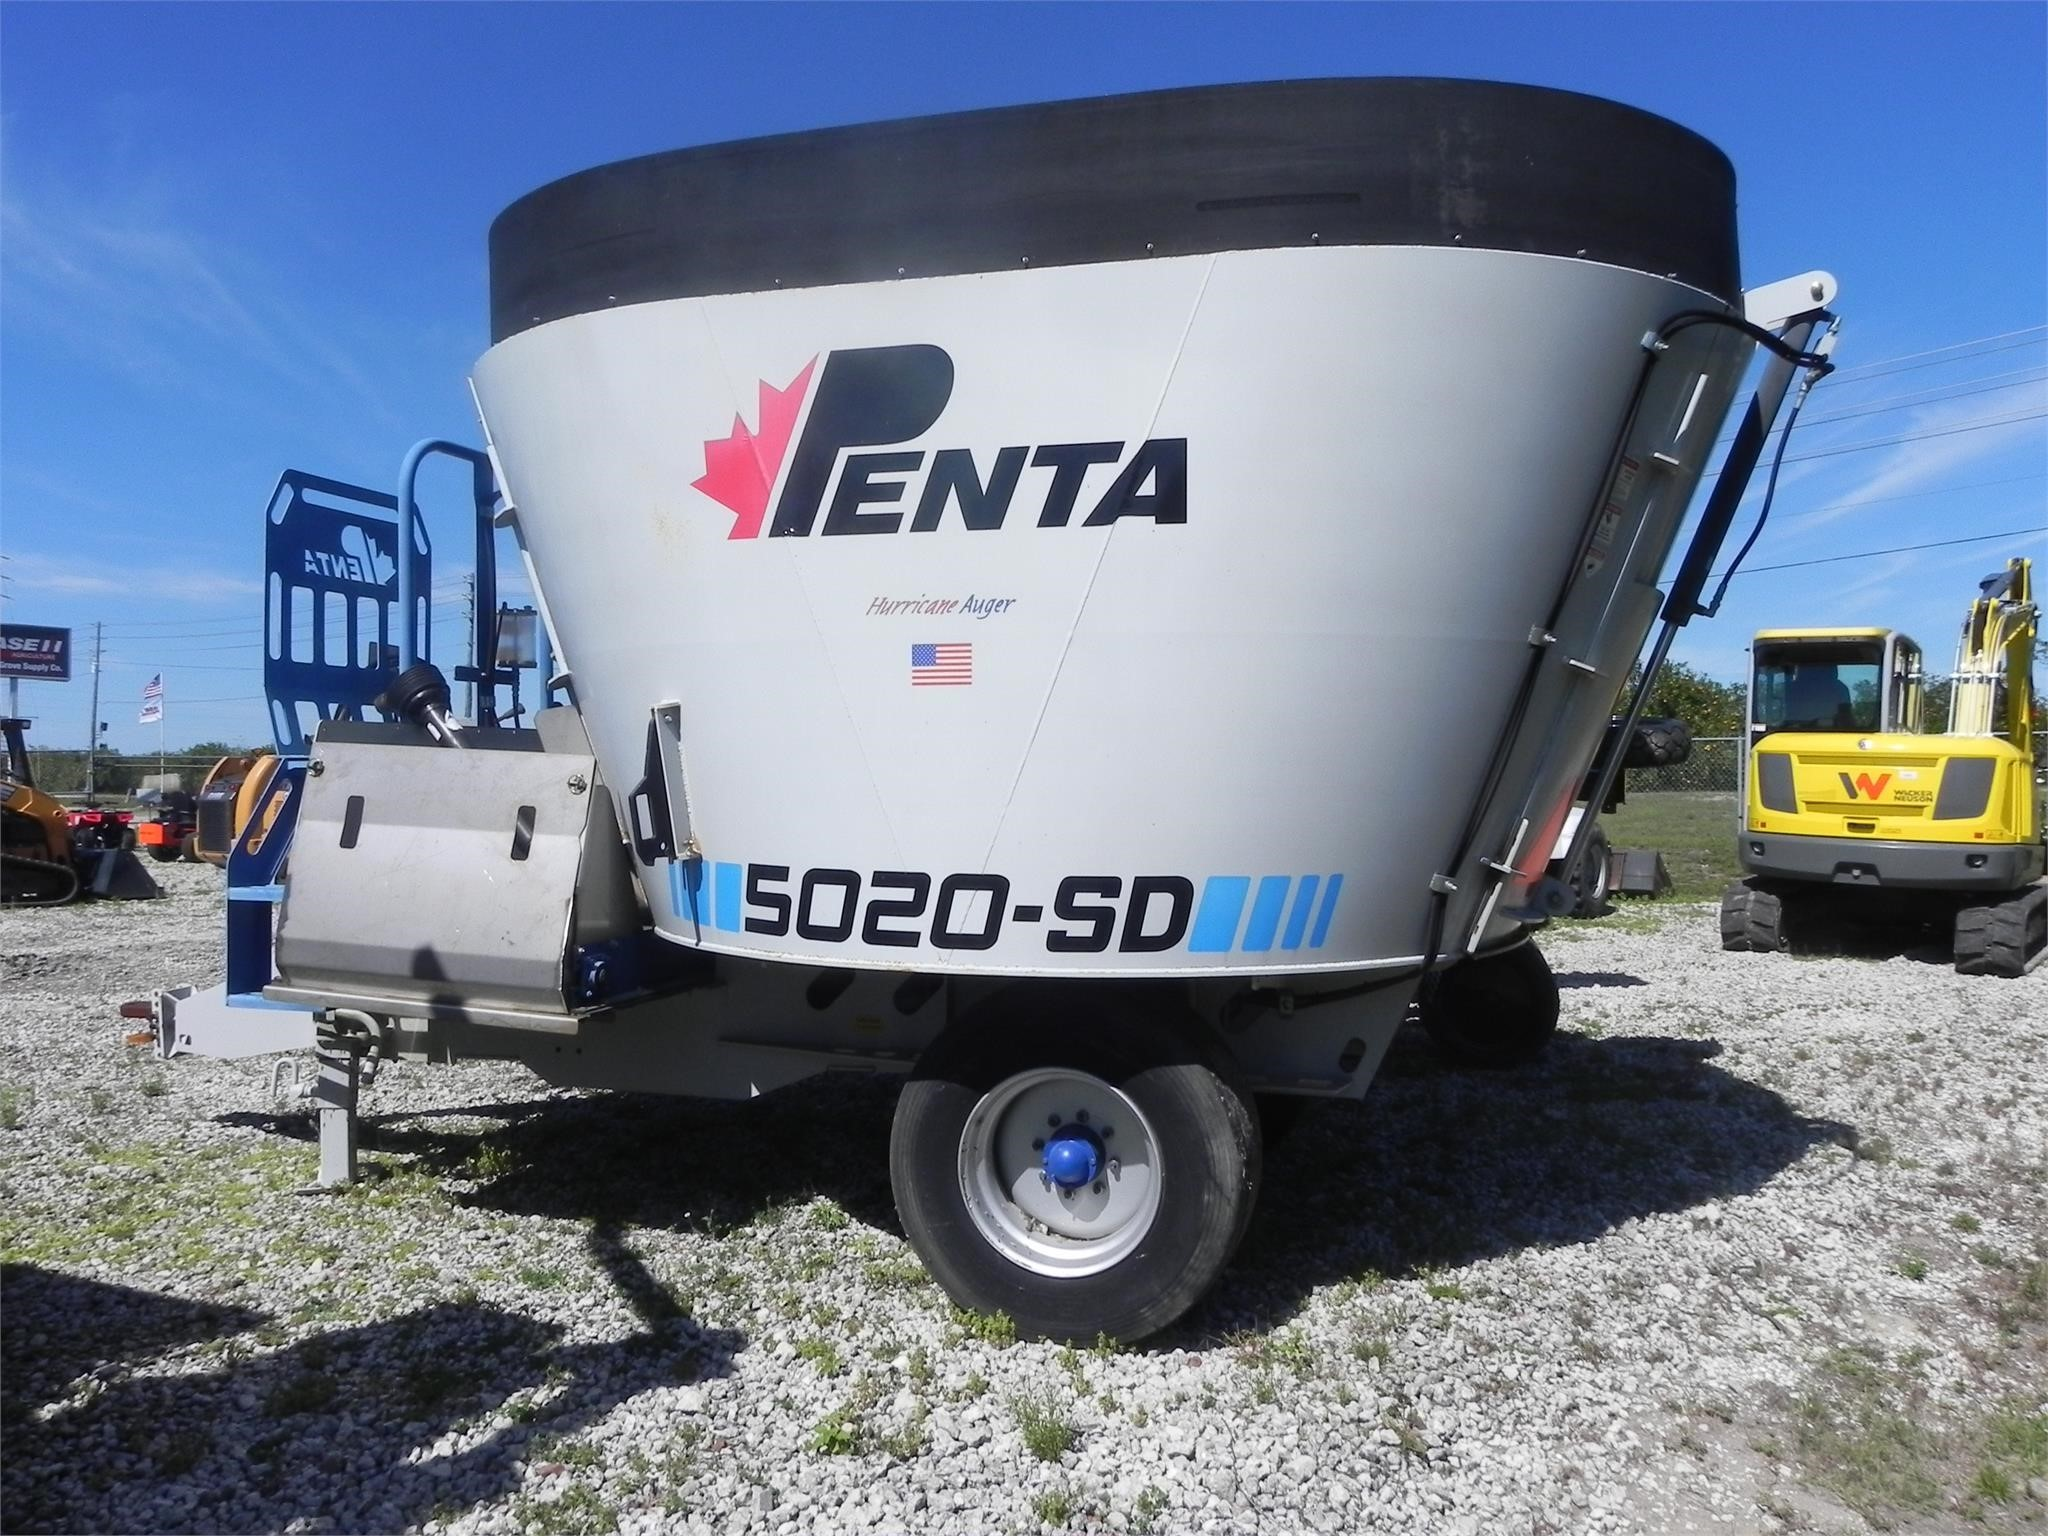 2014 Penta 5020SD Grinders and Mixer